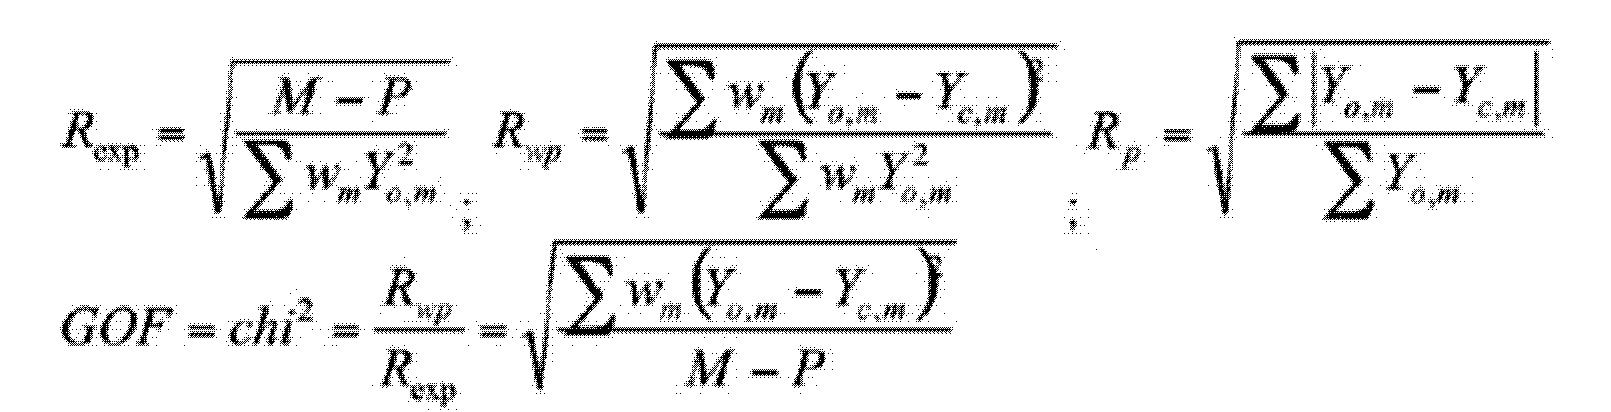 Figure CN104093731AD00172